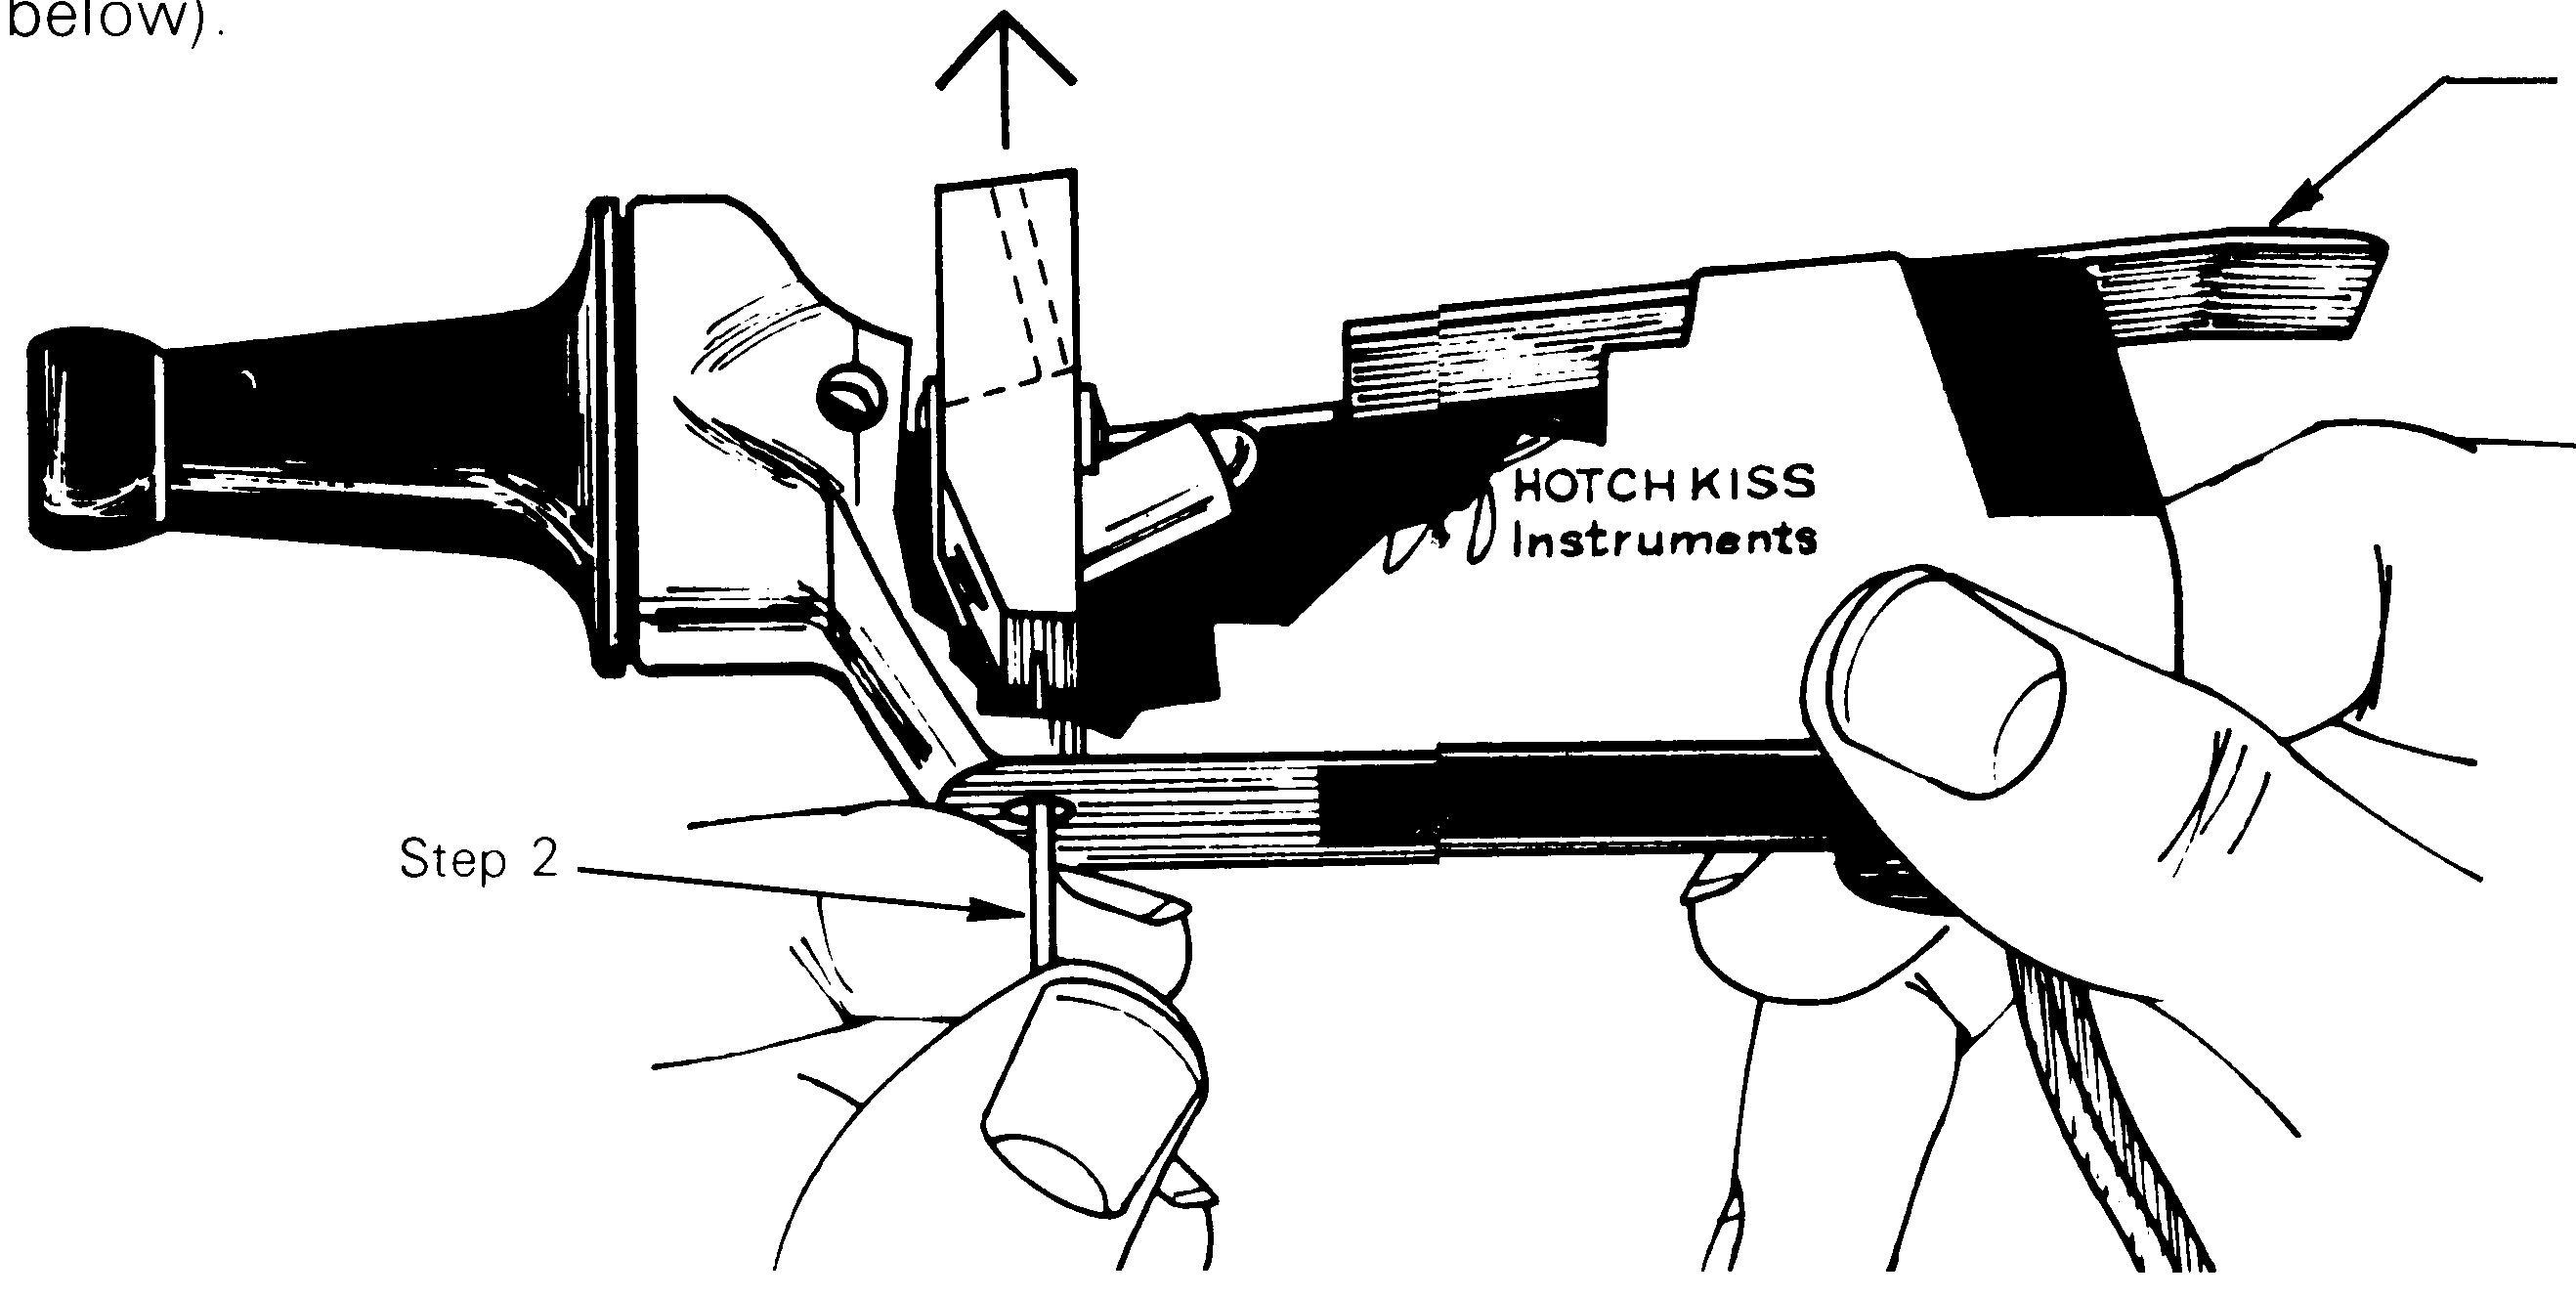 hotchkiss-instructions-figure-3-001.jpg